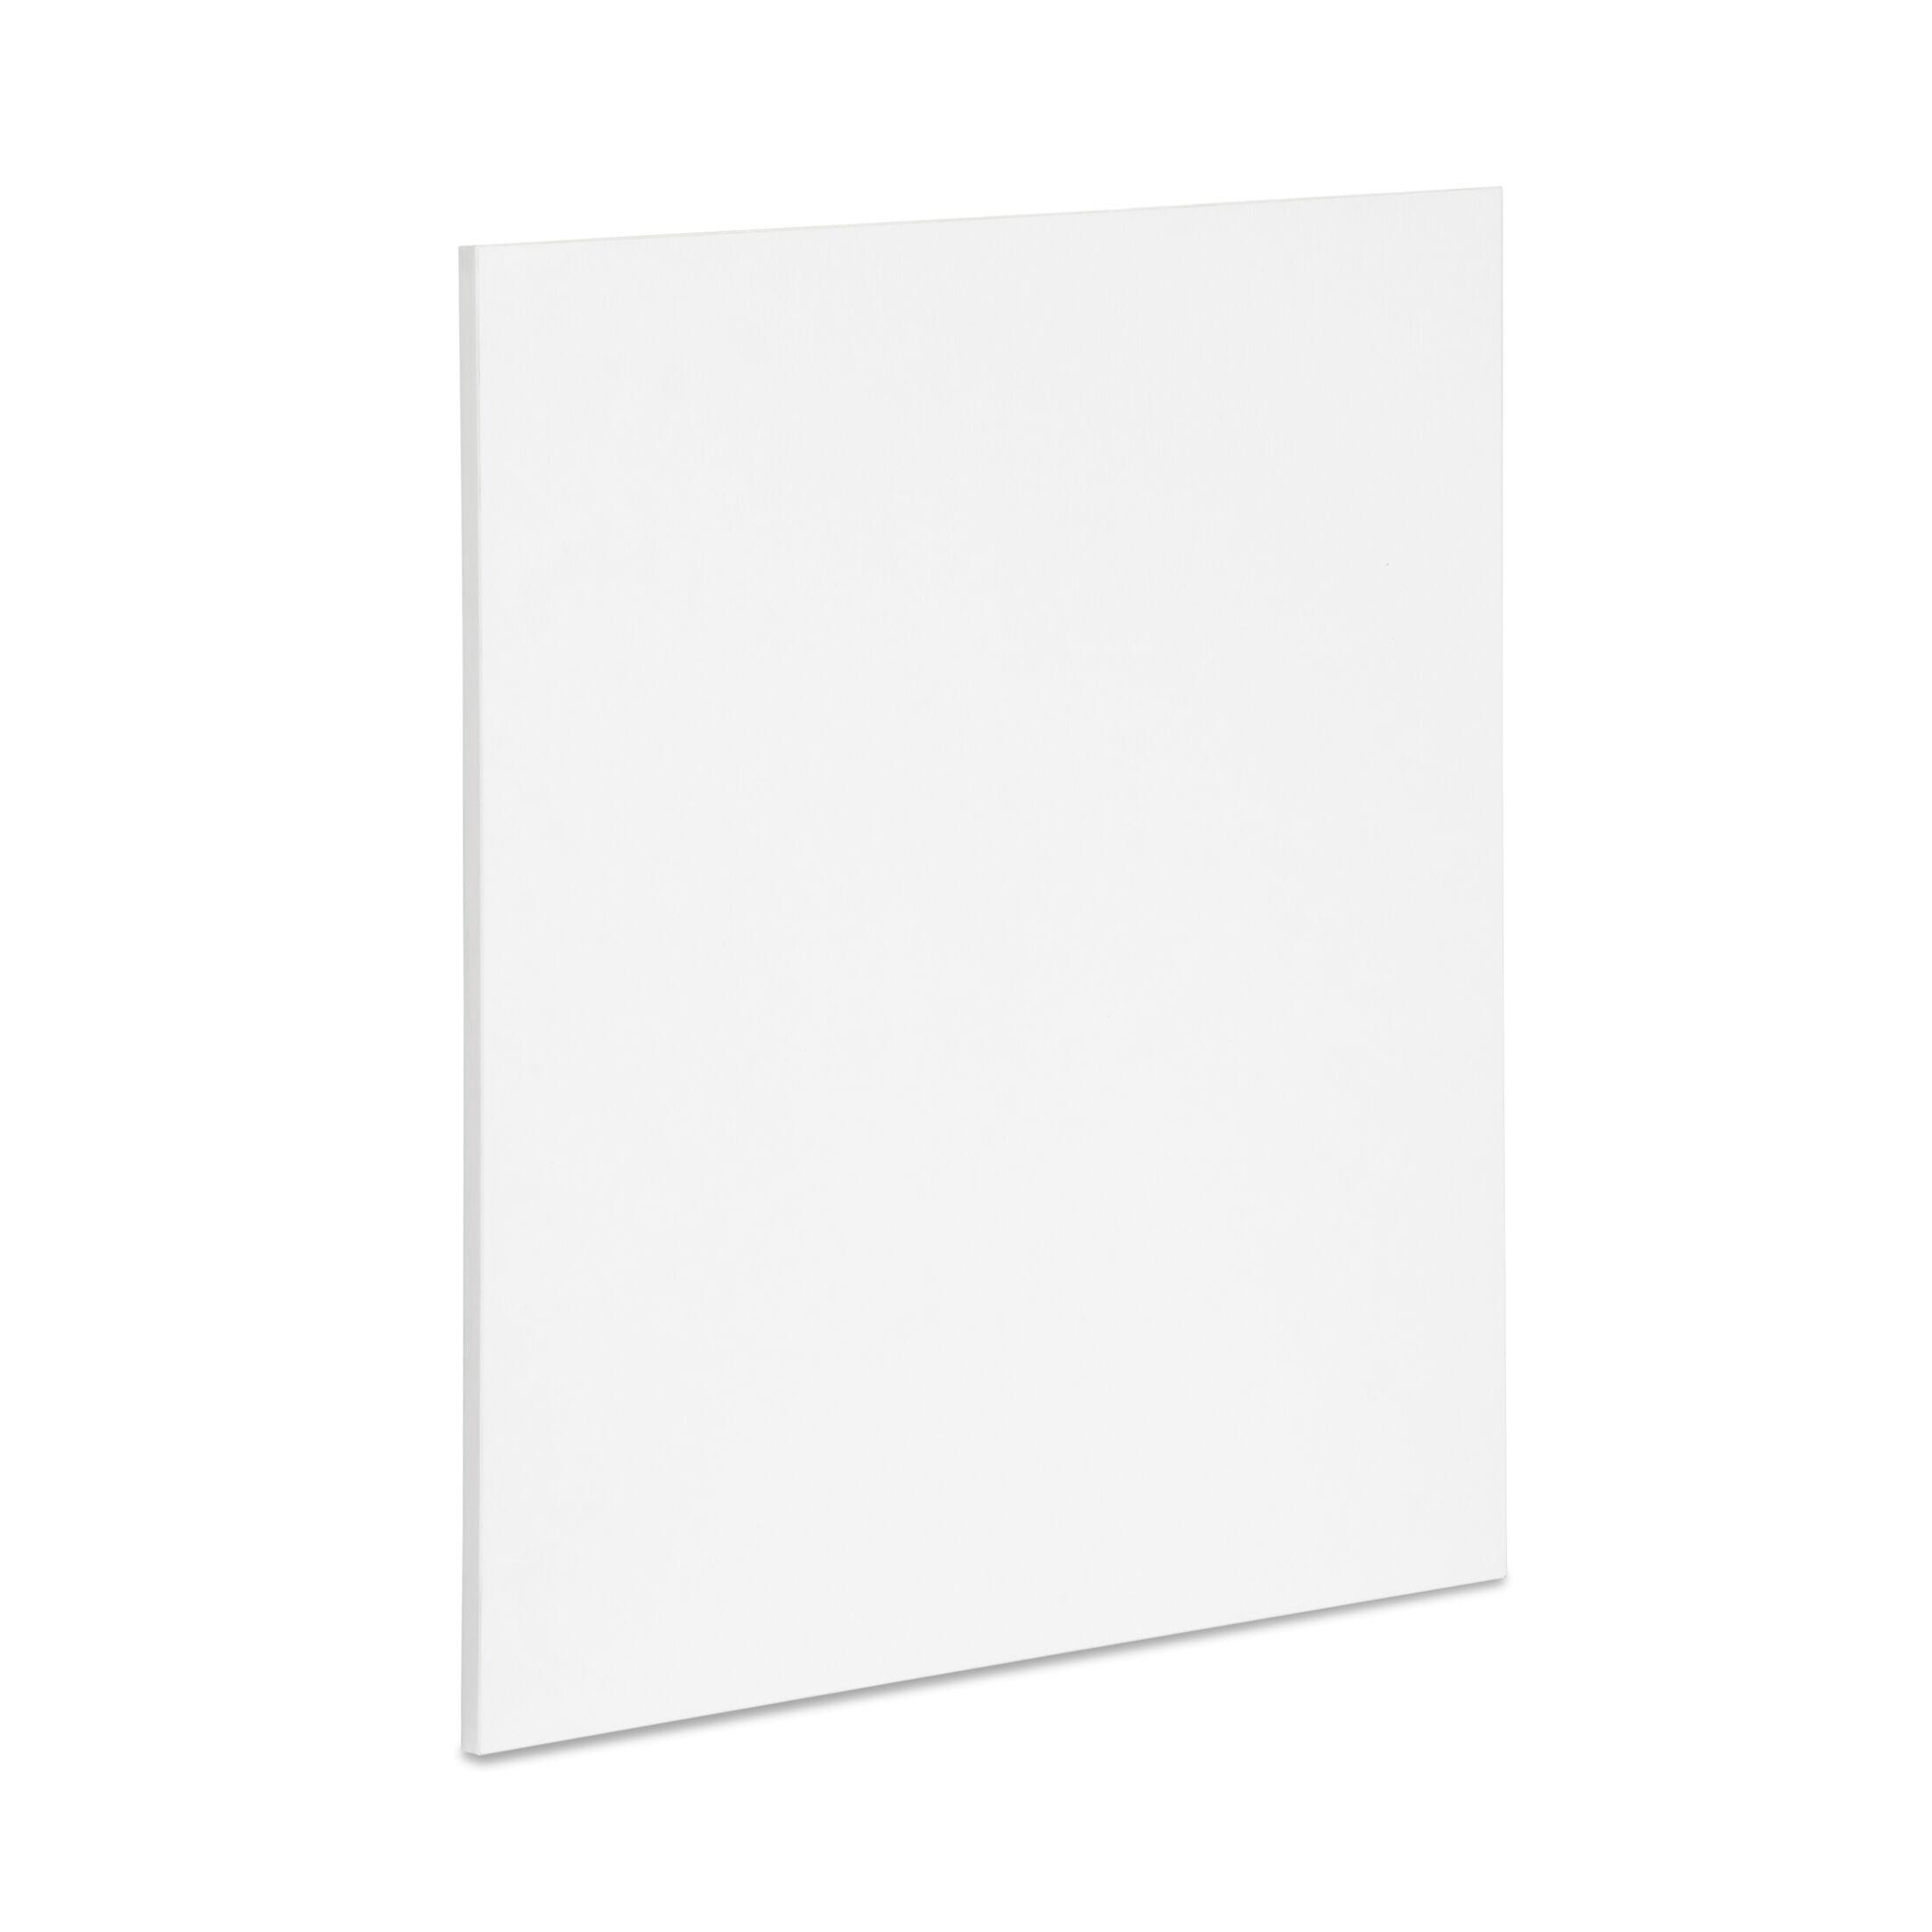 Gerth Desk End Leg Panel Finish: White, Size: 27